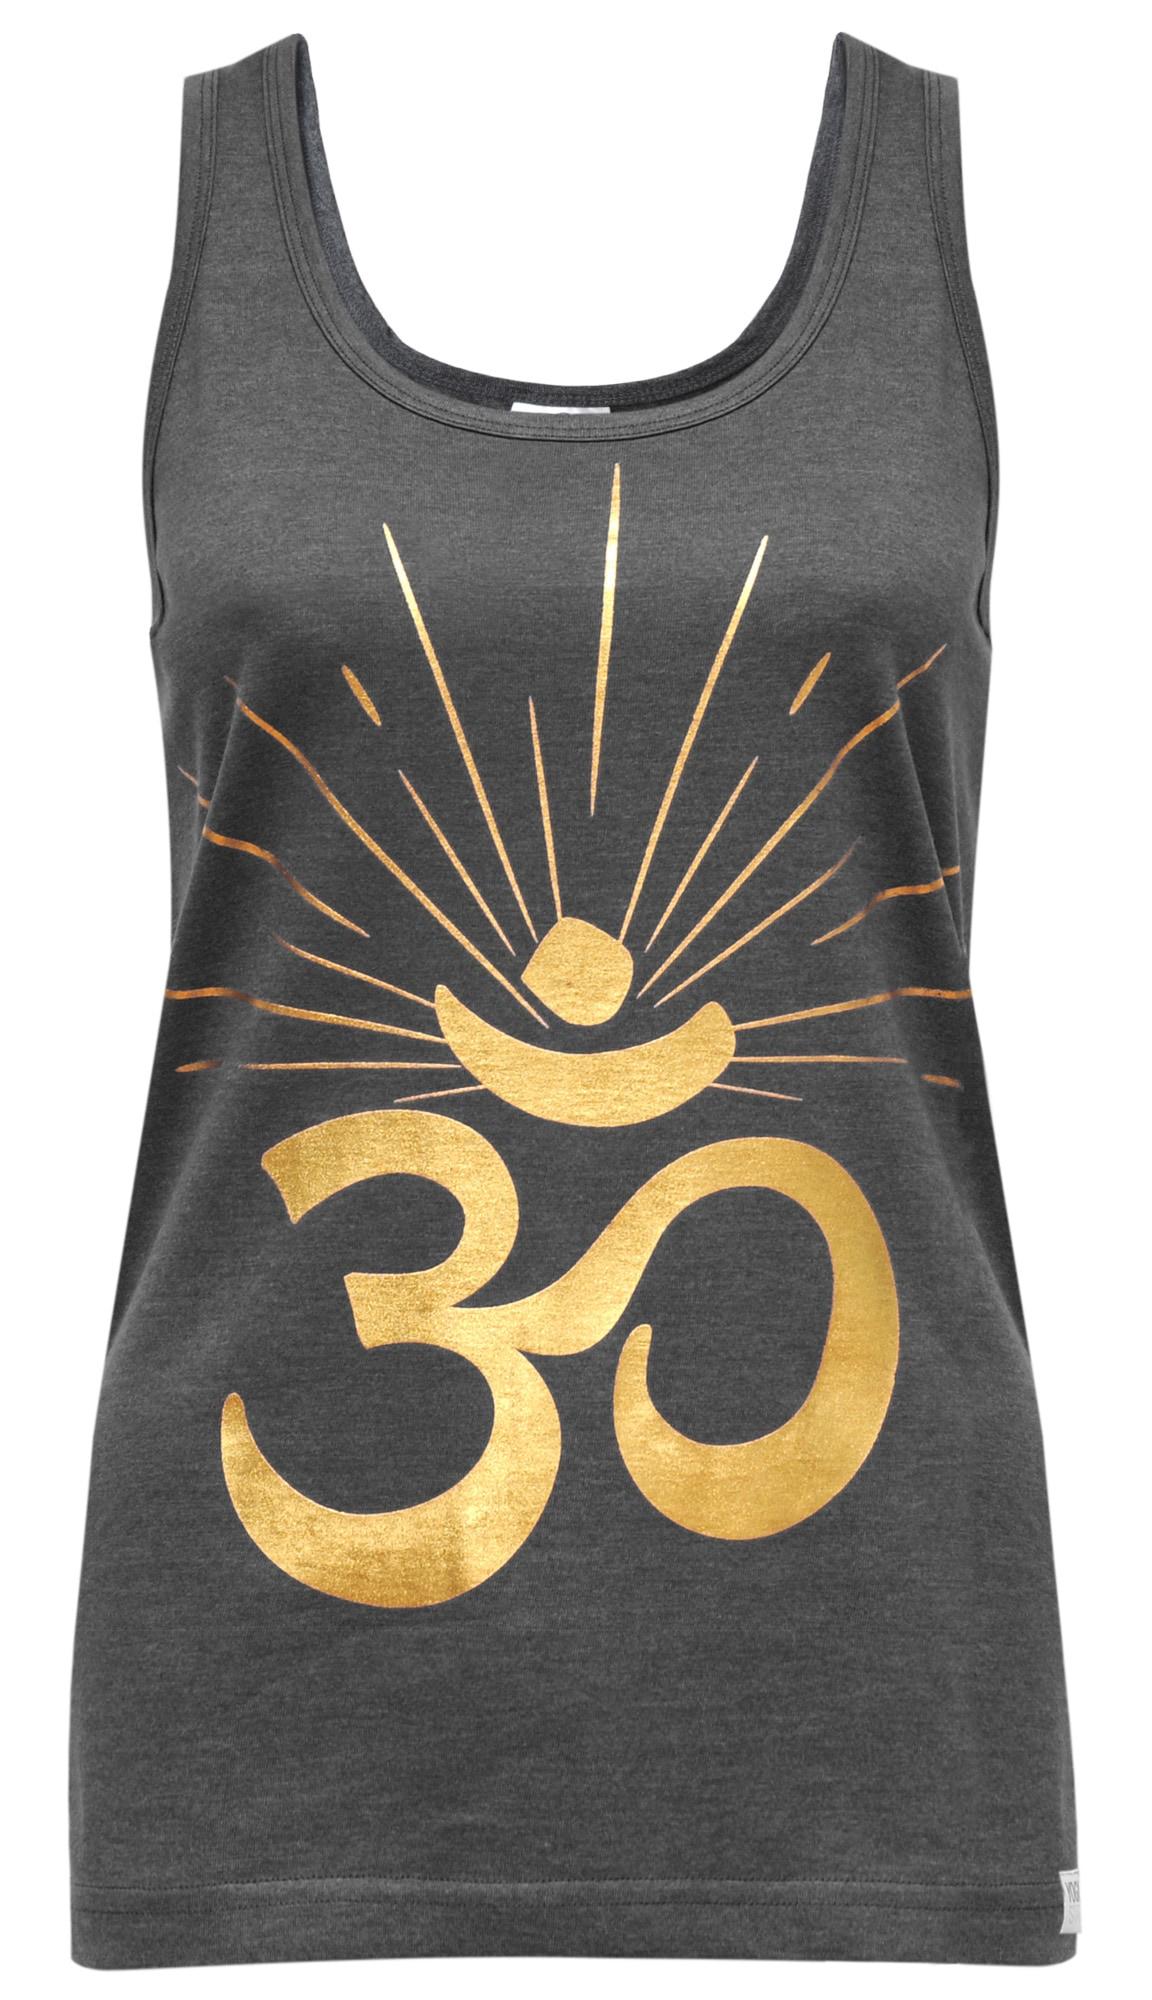 Yoga-tank-top 'om Sunray'   Bekleidung > Tops > Tanktops   Gold - Dunkelgrau   YOGISTAR.COM